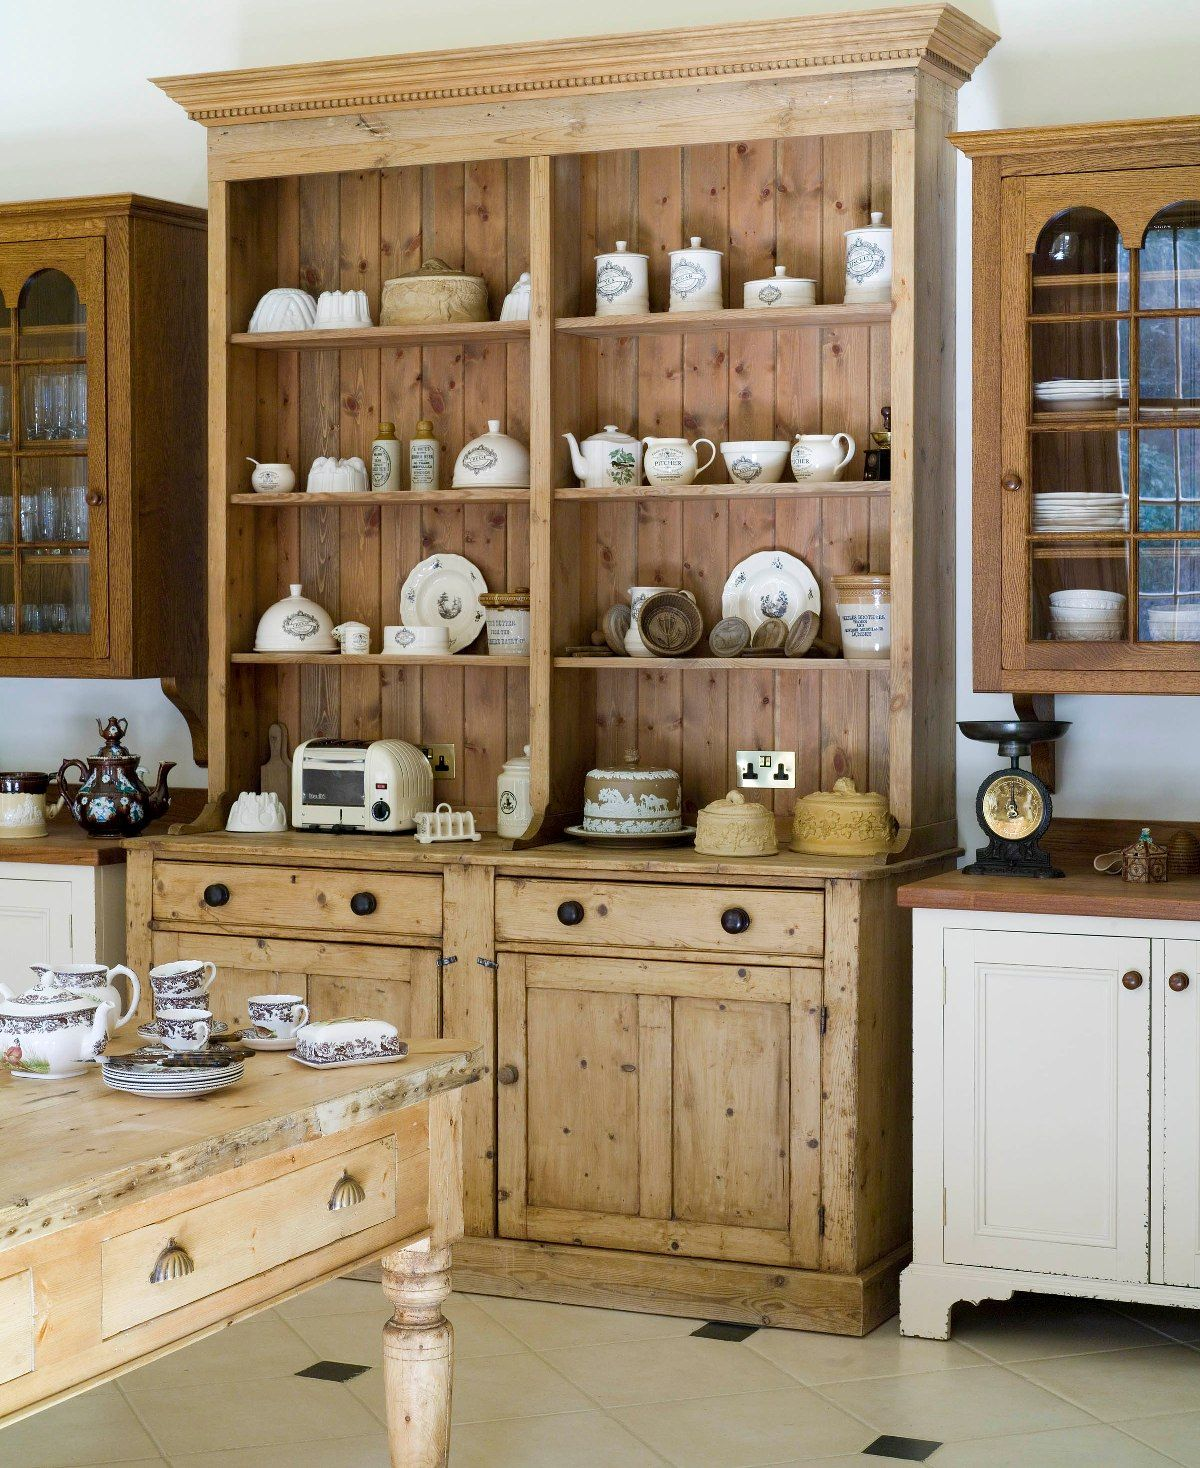 Pine Kitchen Cabinet: Natural Pine Cupboard In The Kitchen